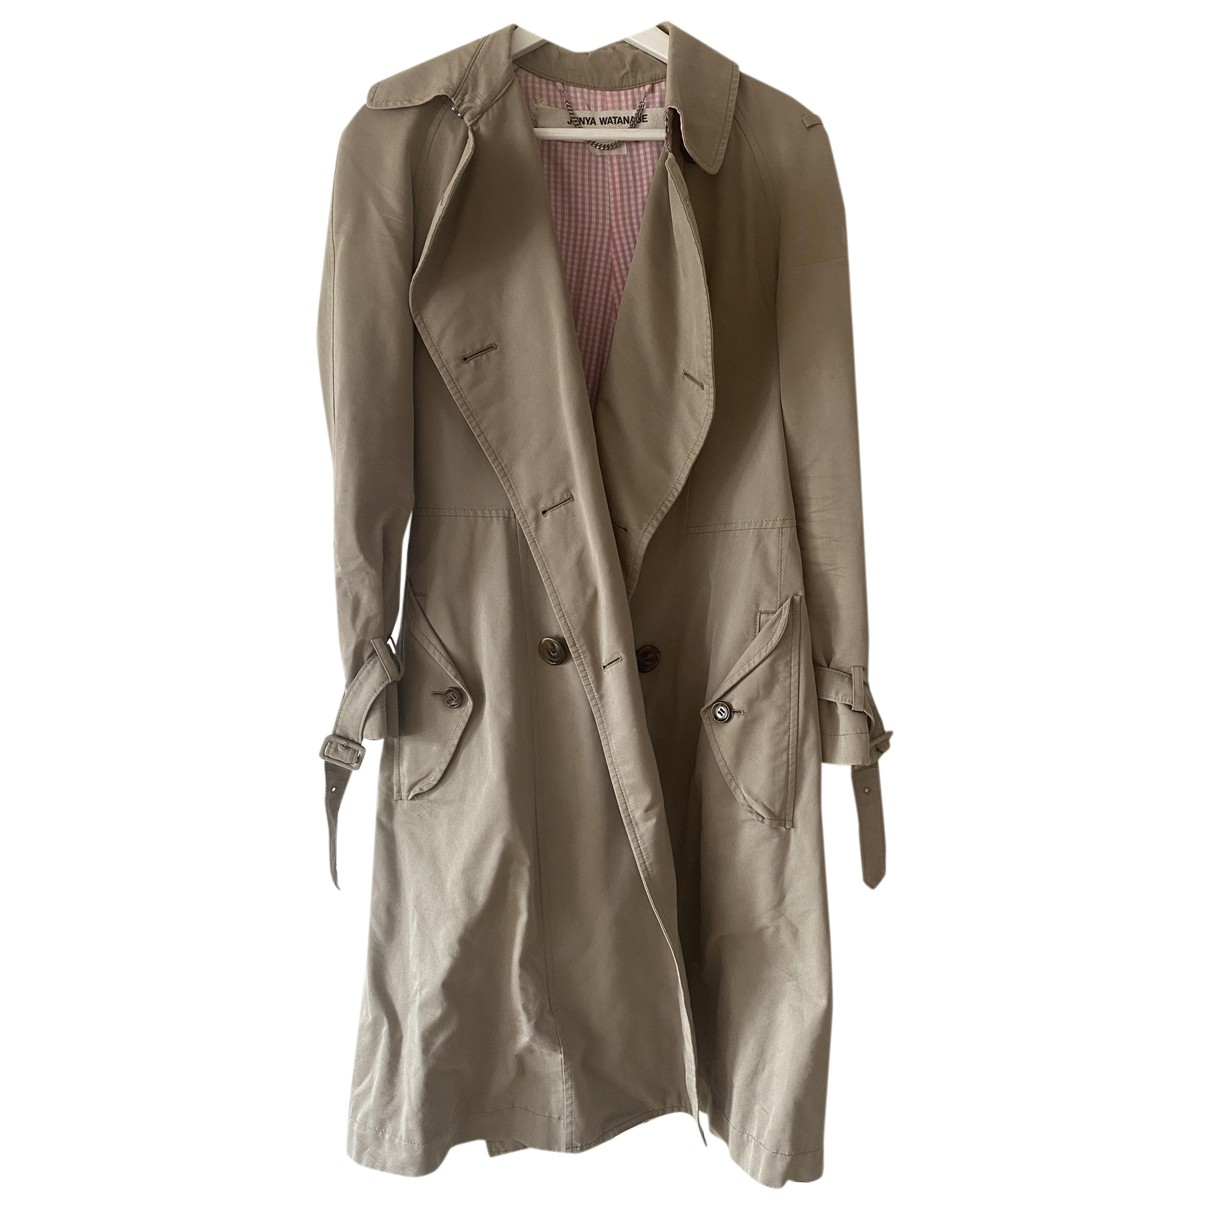 Junya Watanabe \N Beige Cotton coat for Women M International